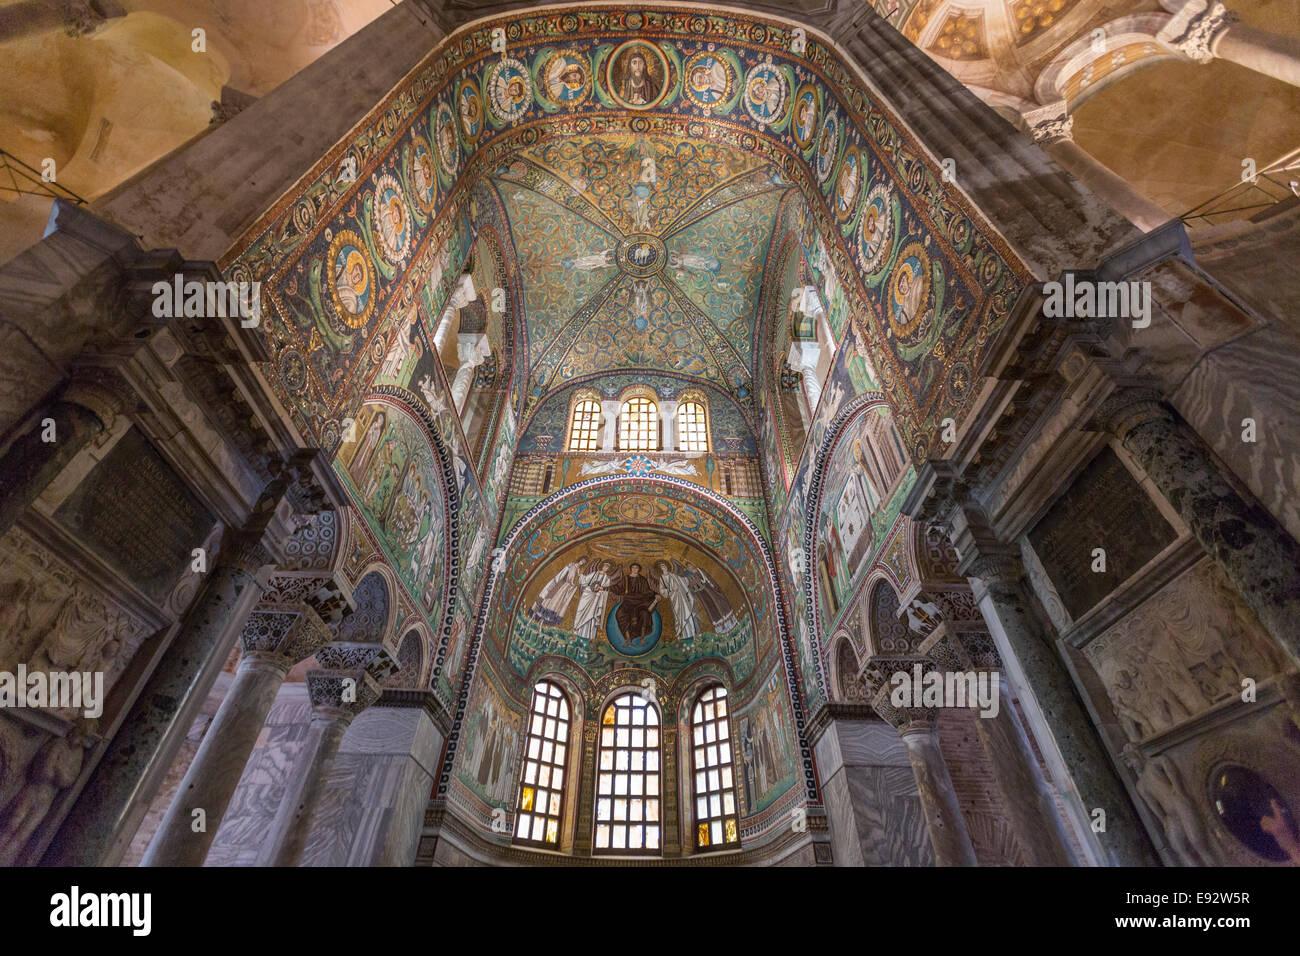 basilica-of-san-vitale-byzantine-mosaics